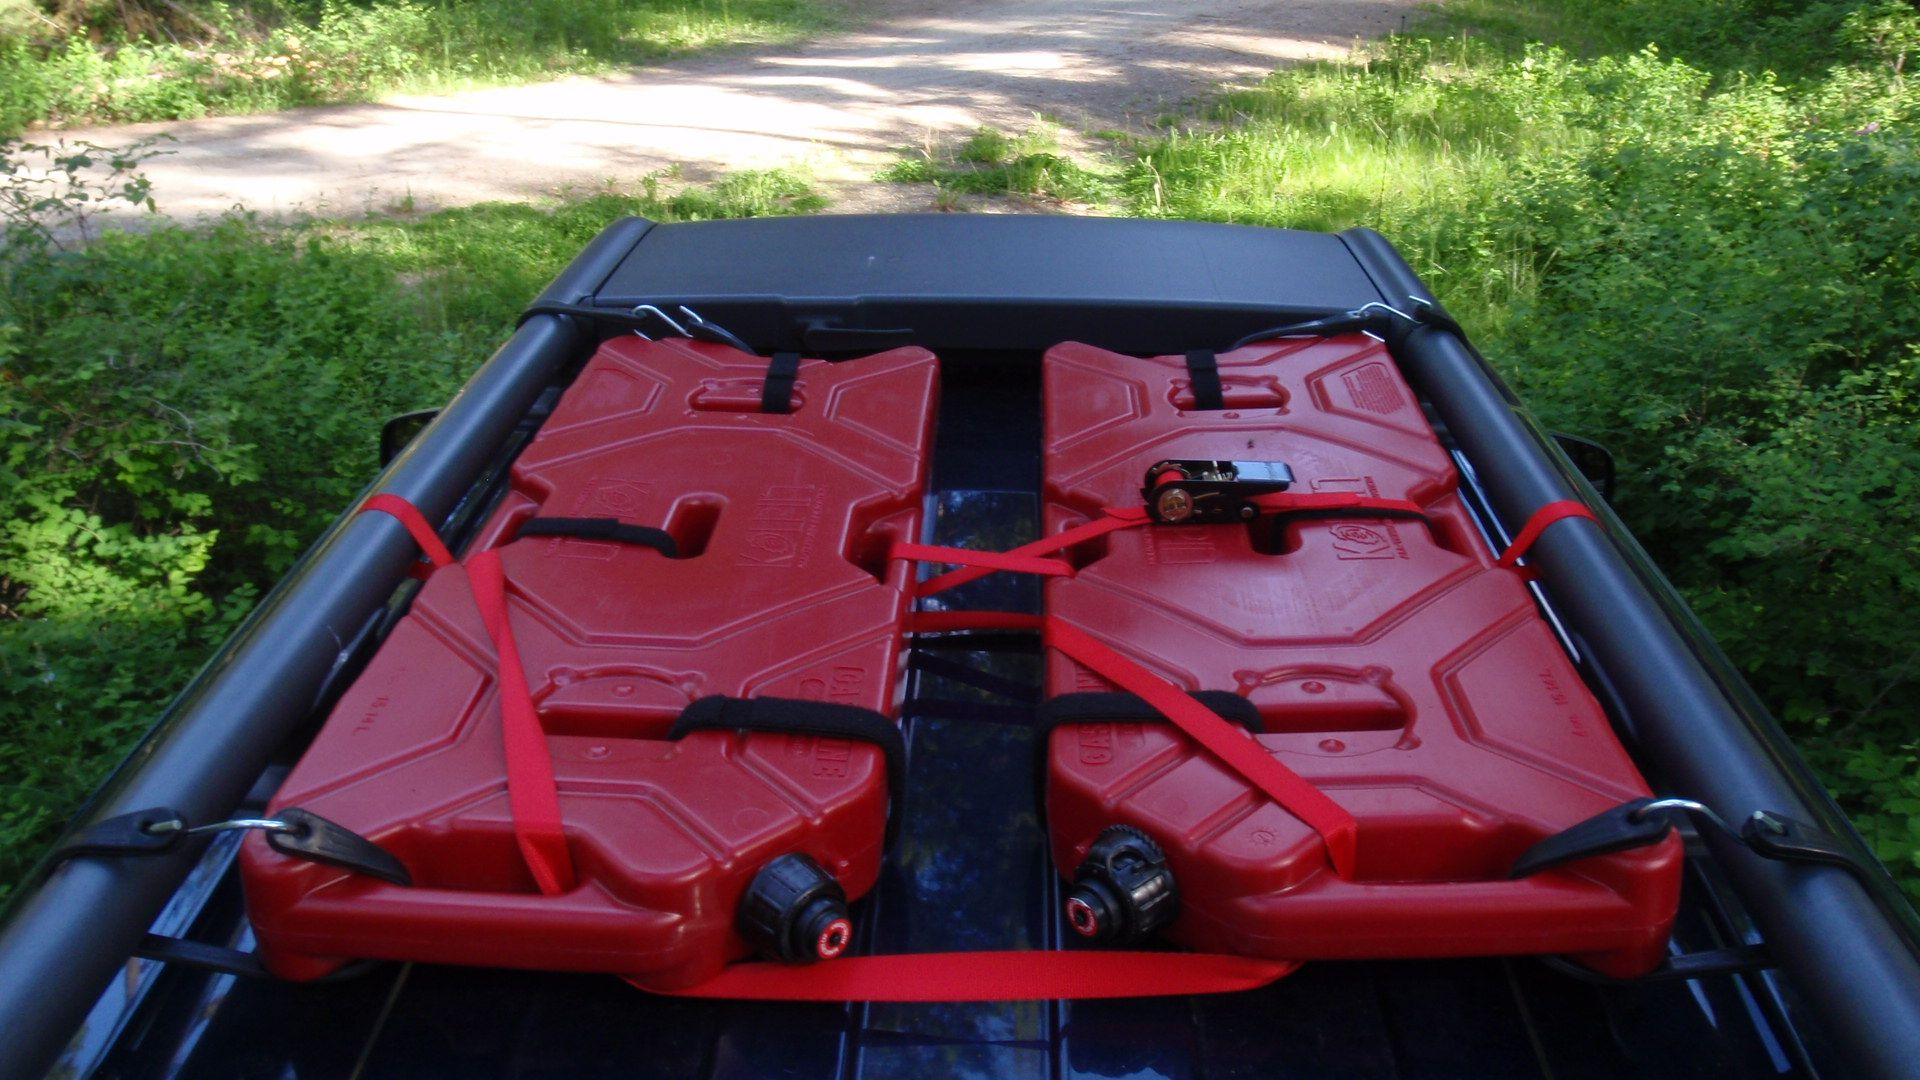 Nissan Xterra Gas Can Kolpin Forum Lets Talk Dual Battery Isolators Toyota Fj Cruiser Forums